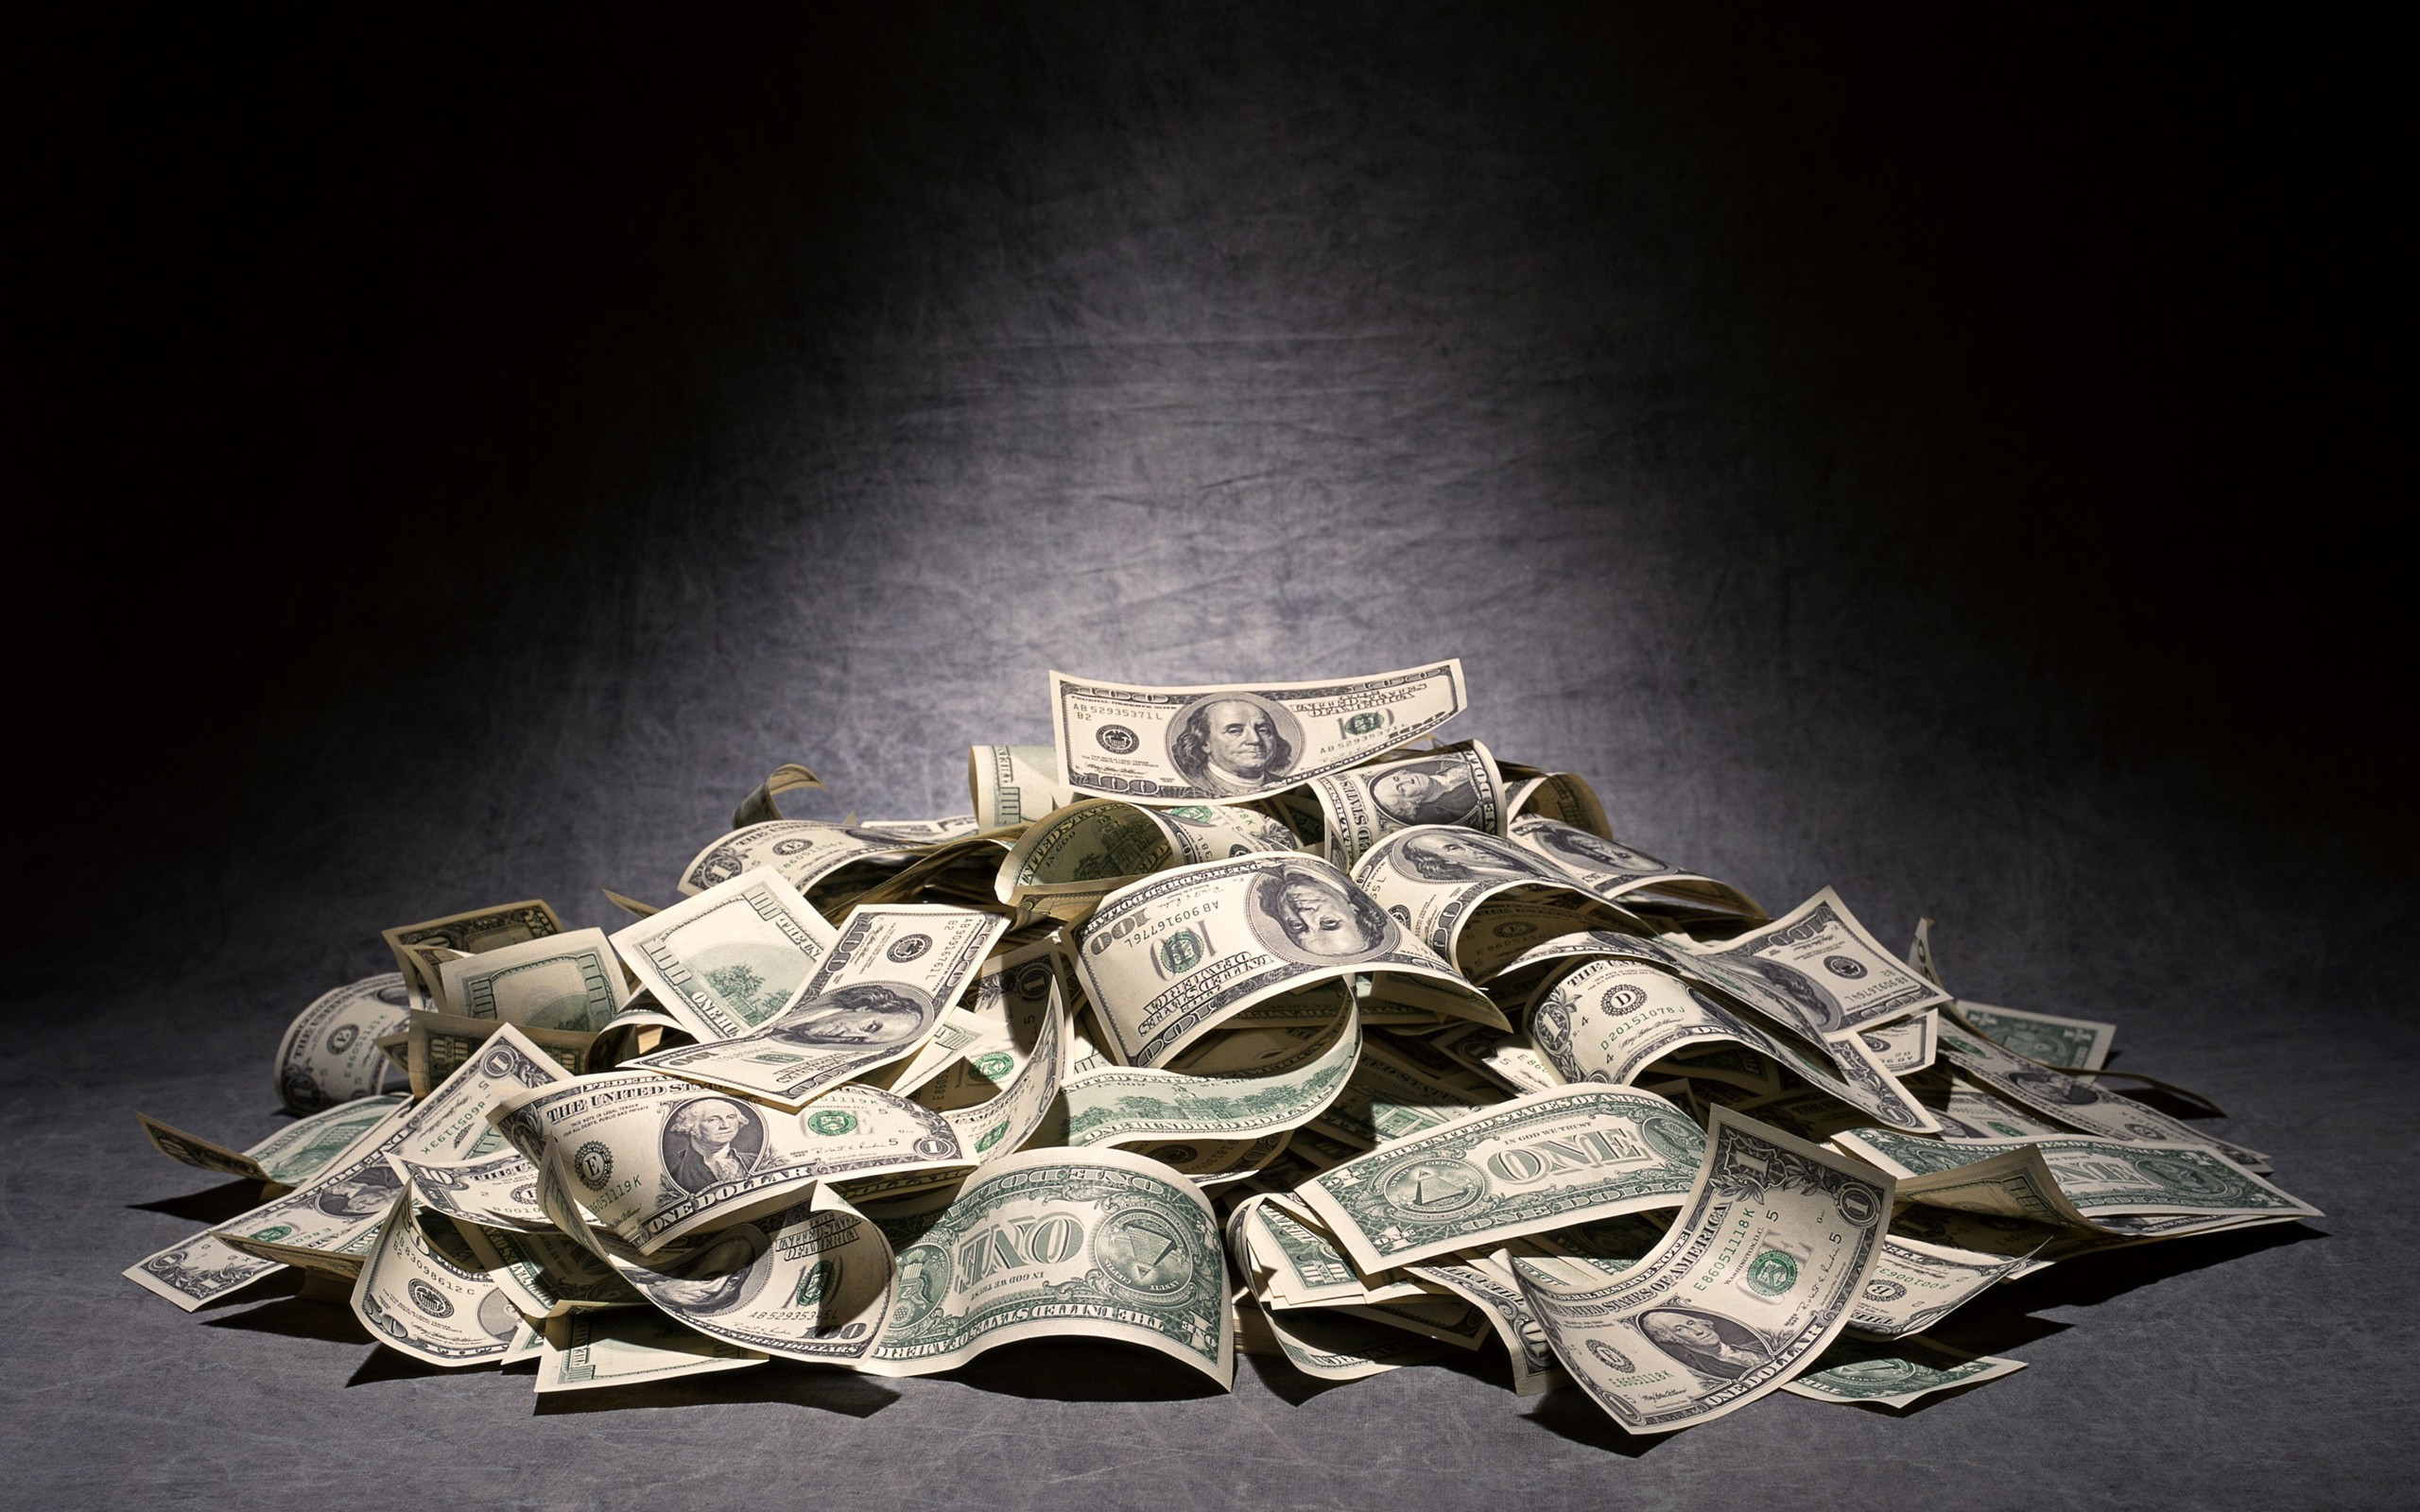 cash money wallpaper background 49518